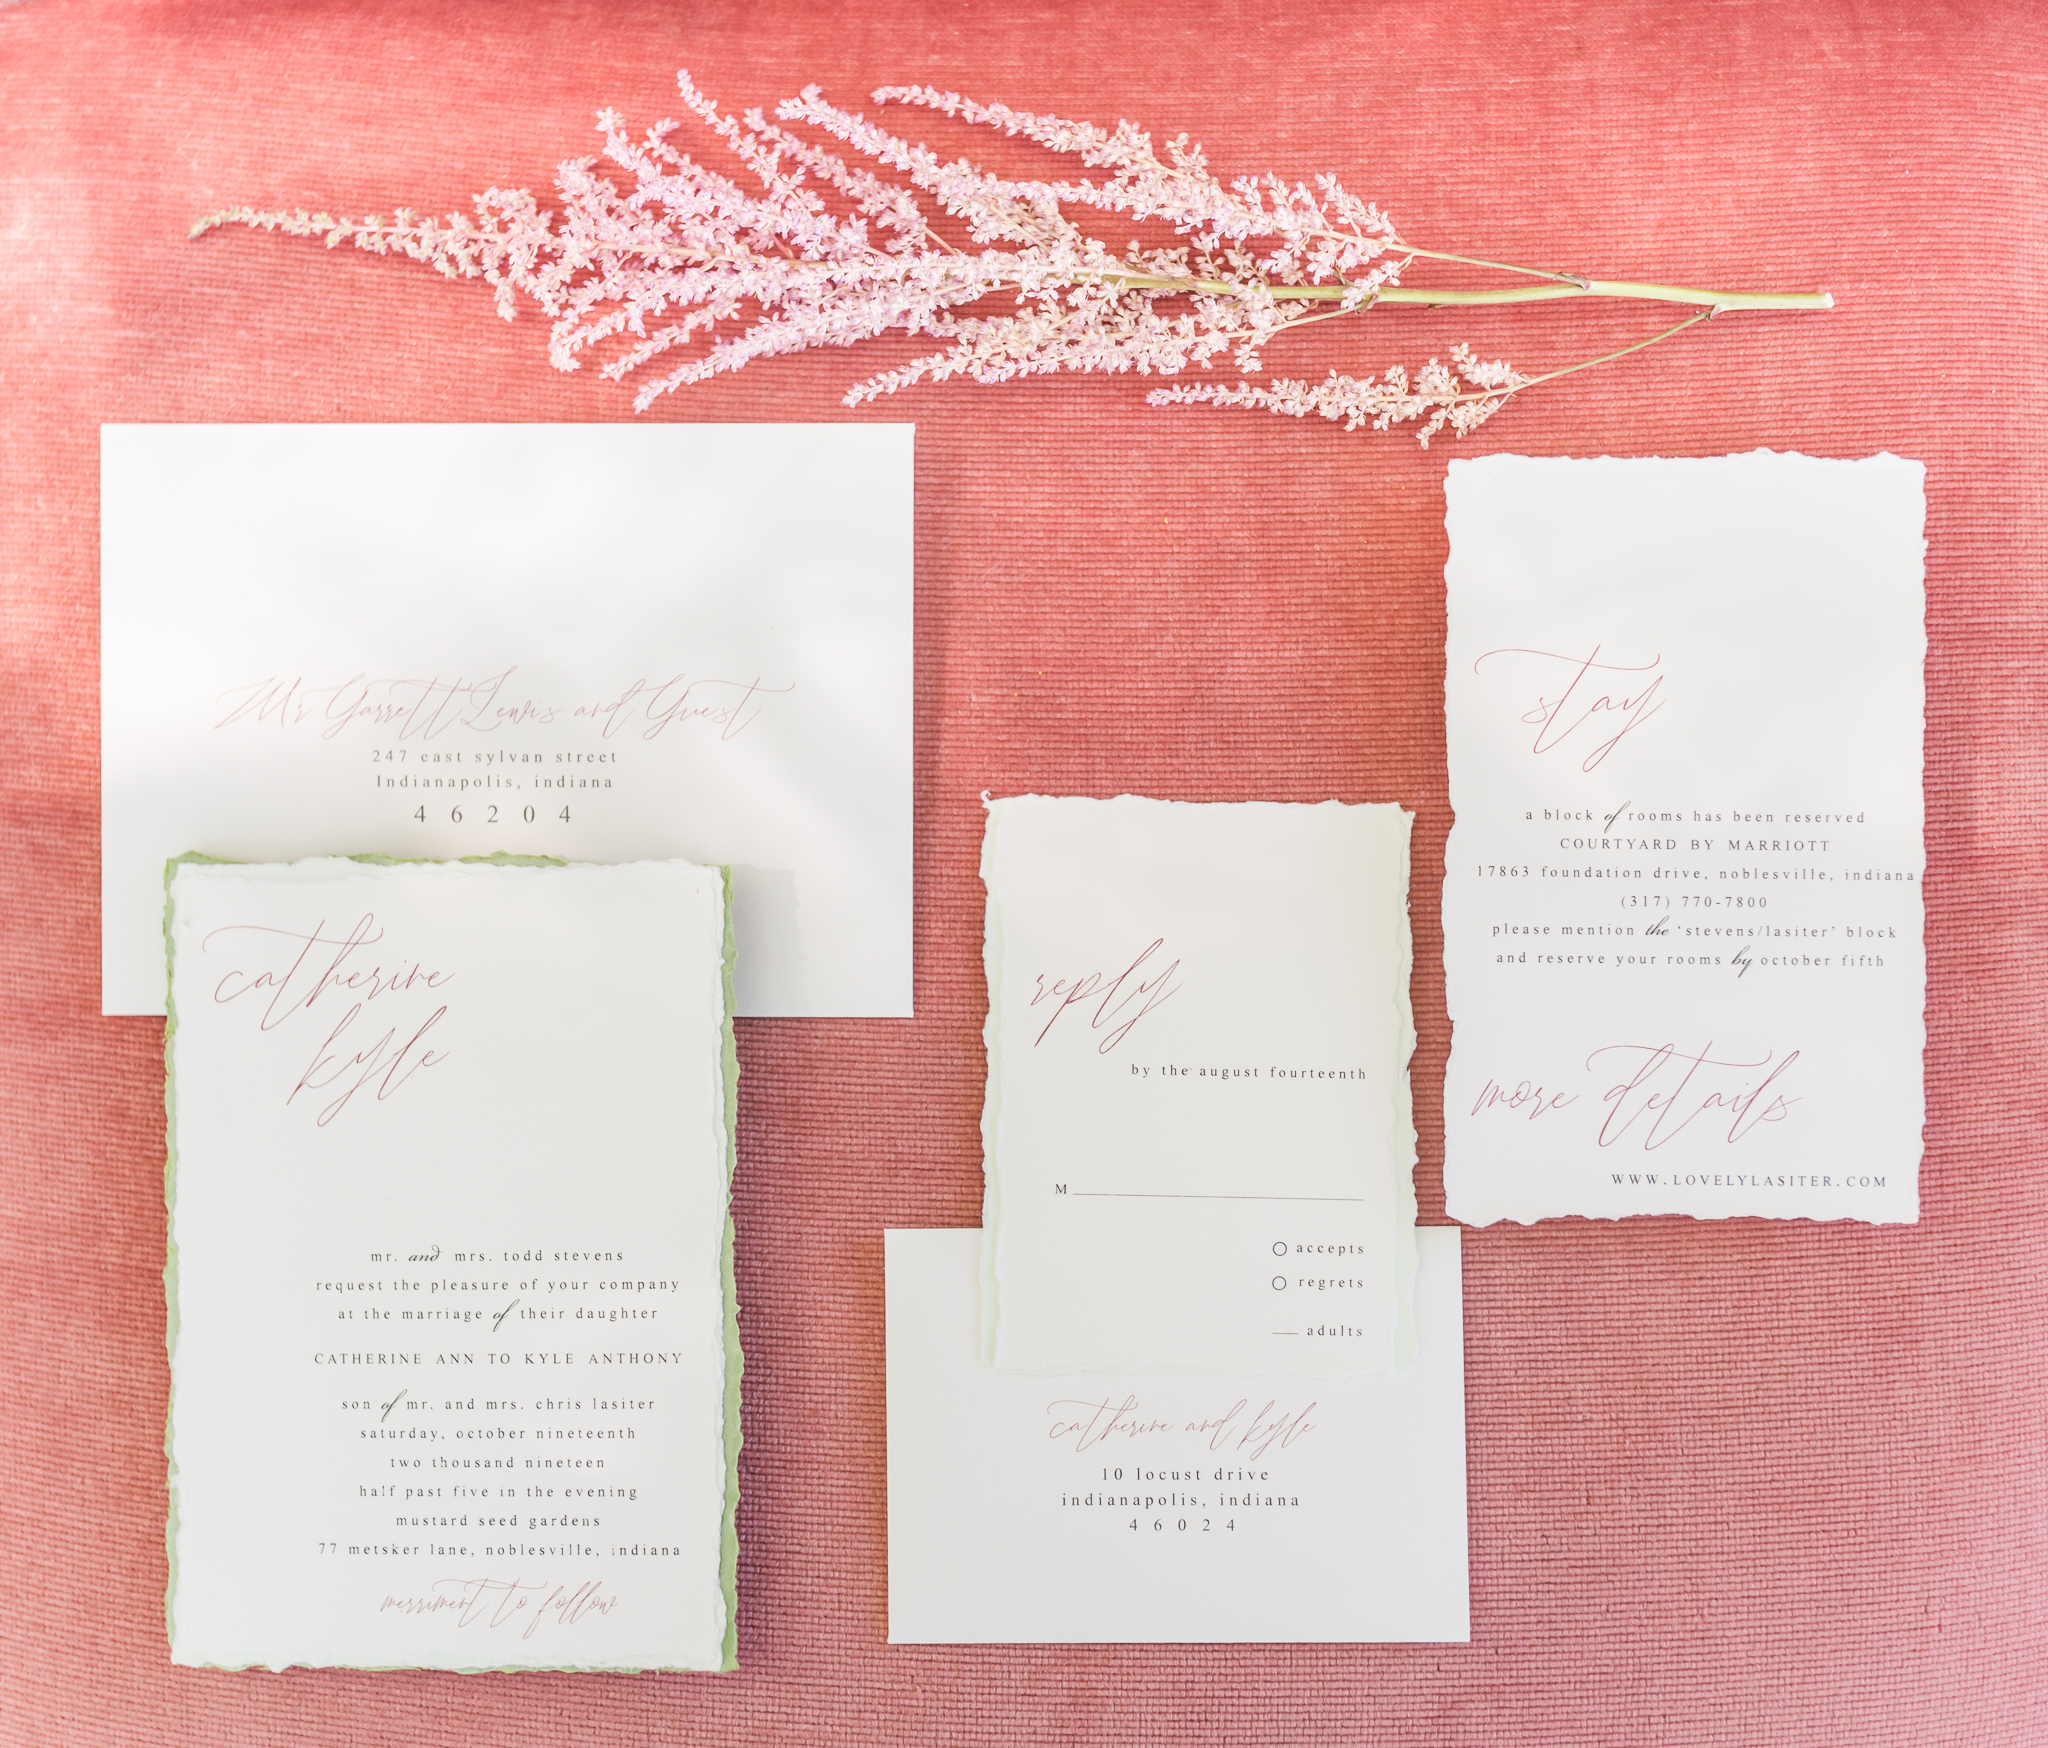 Mustard Seed Gardens Wedding Indianapolis Noblesvile Fishers Wedding Photographer-2.jpg